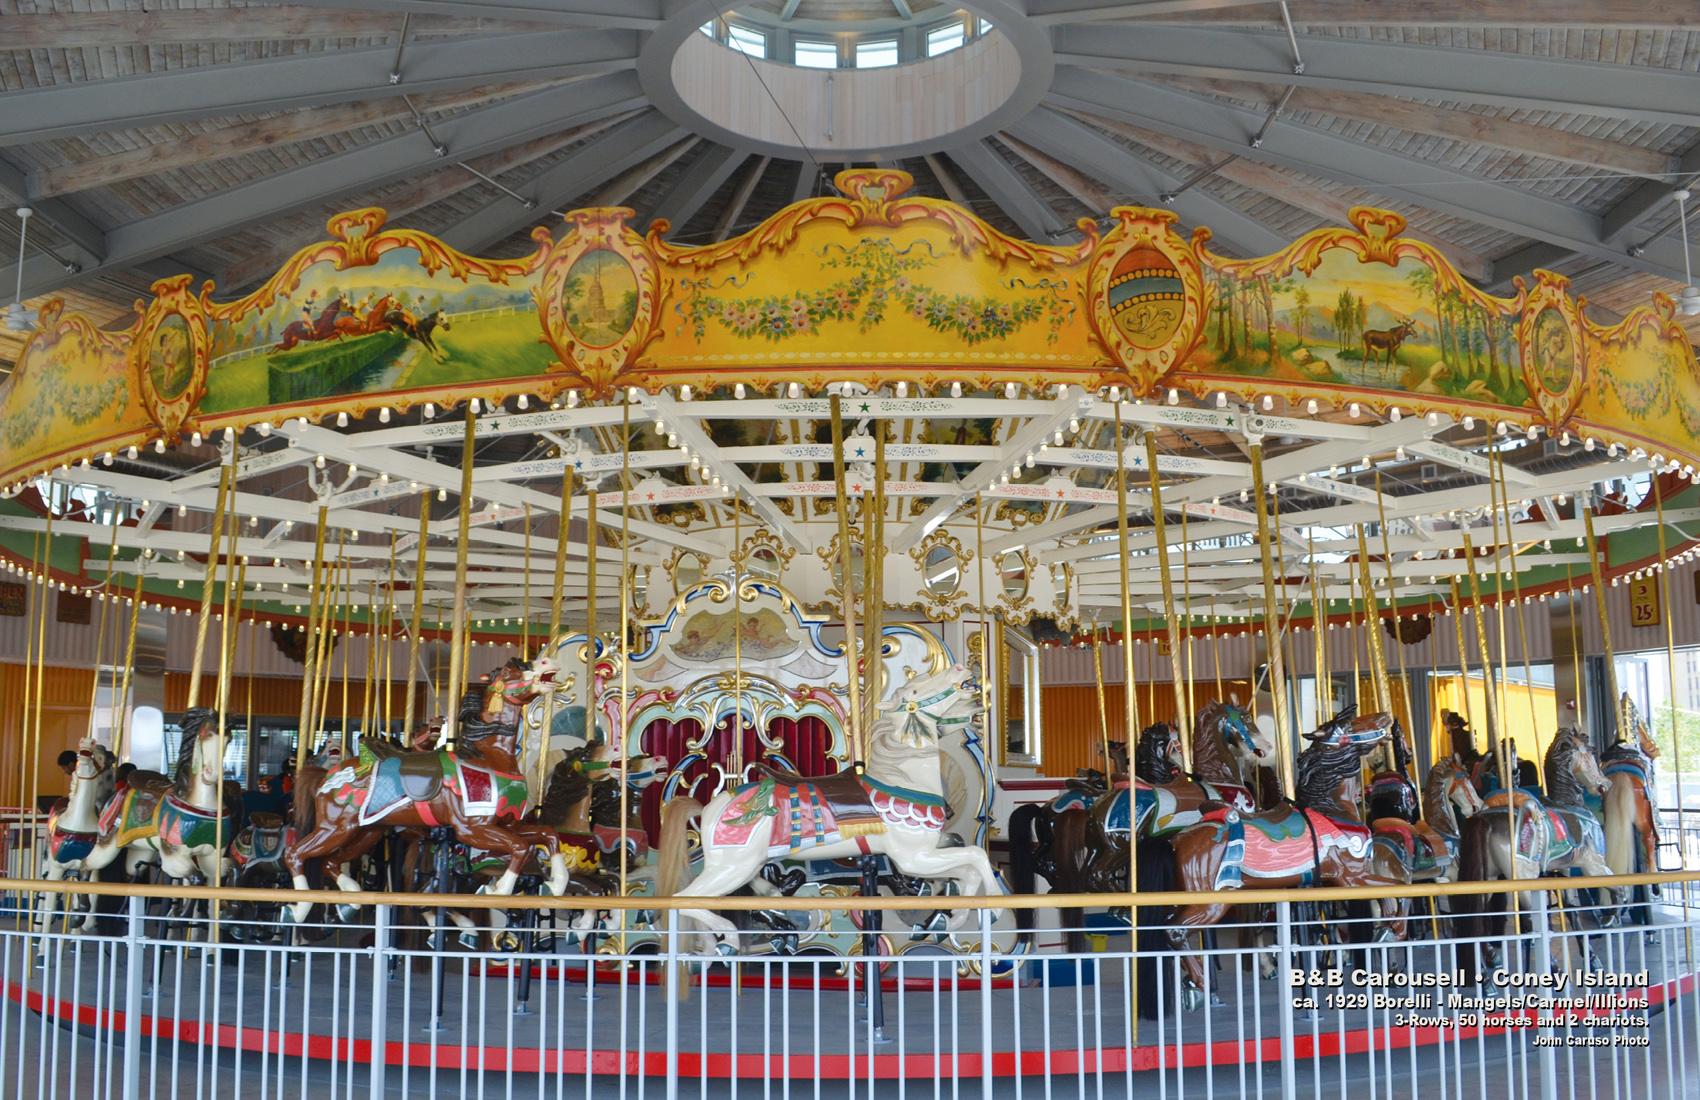 Historic-B-and-B-carousel-Coney-Island-CNT-center-Sept-13